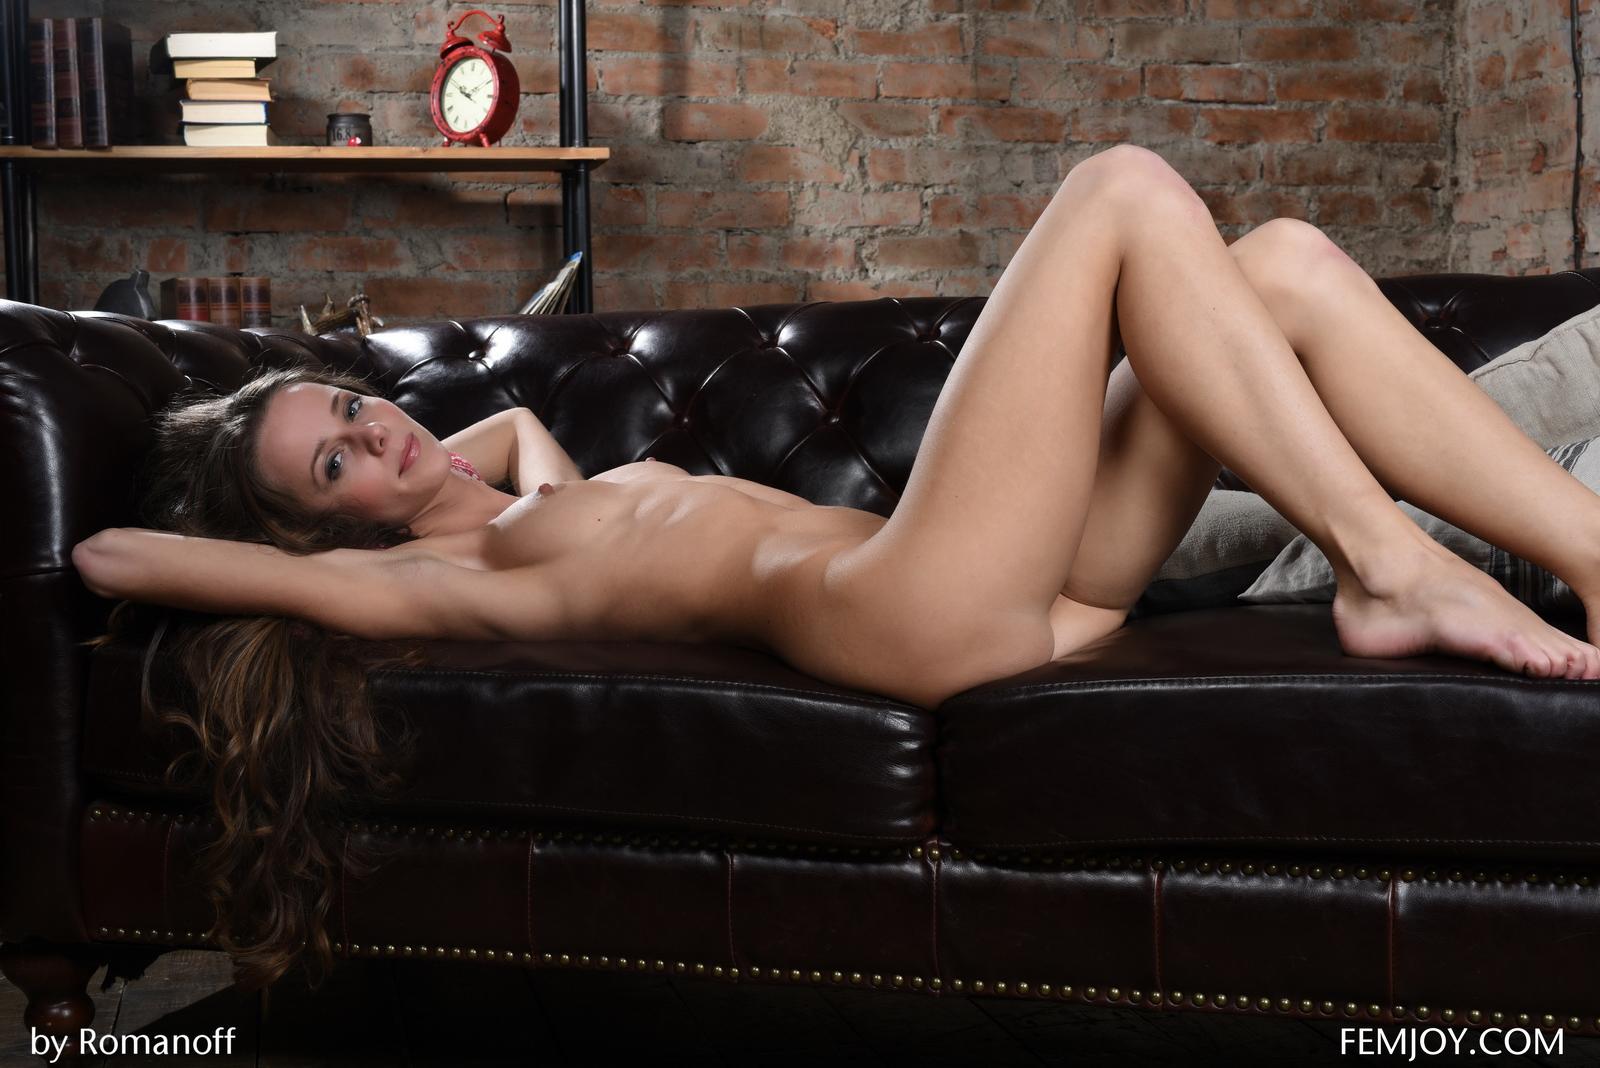 Erotic Nude Fantasy - Official Site